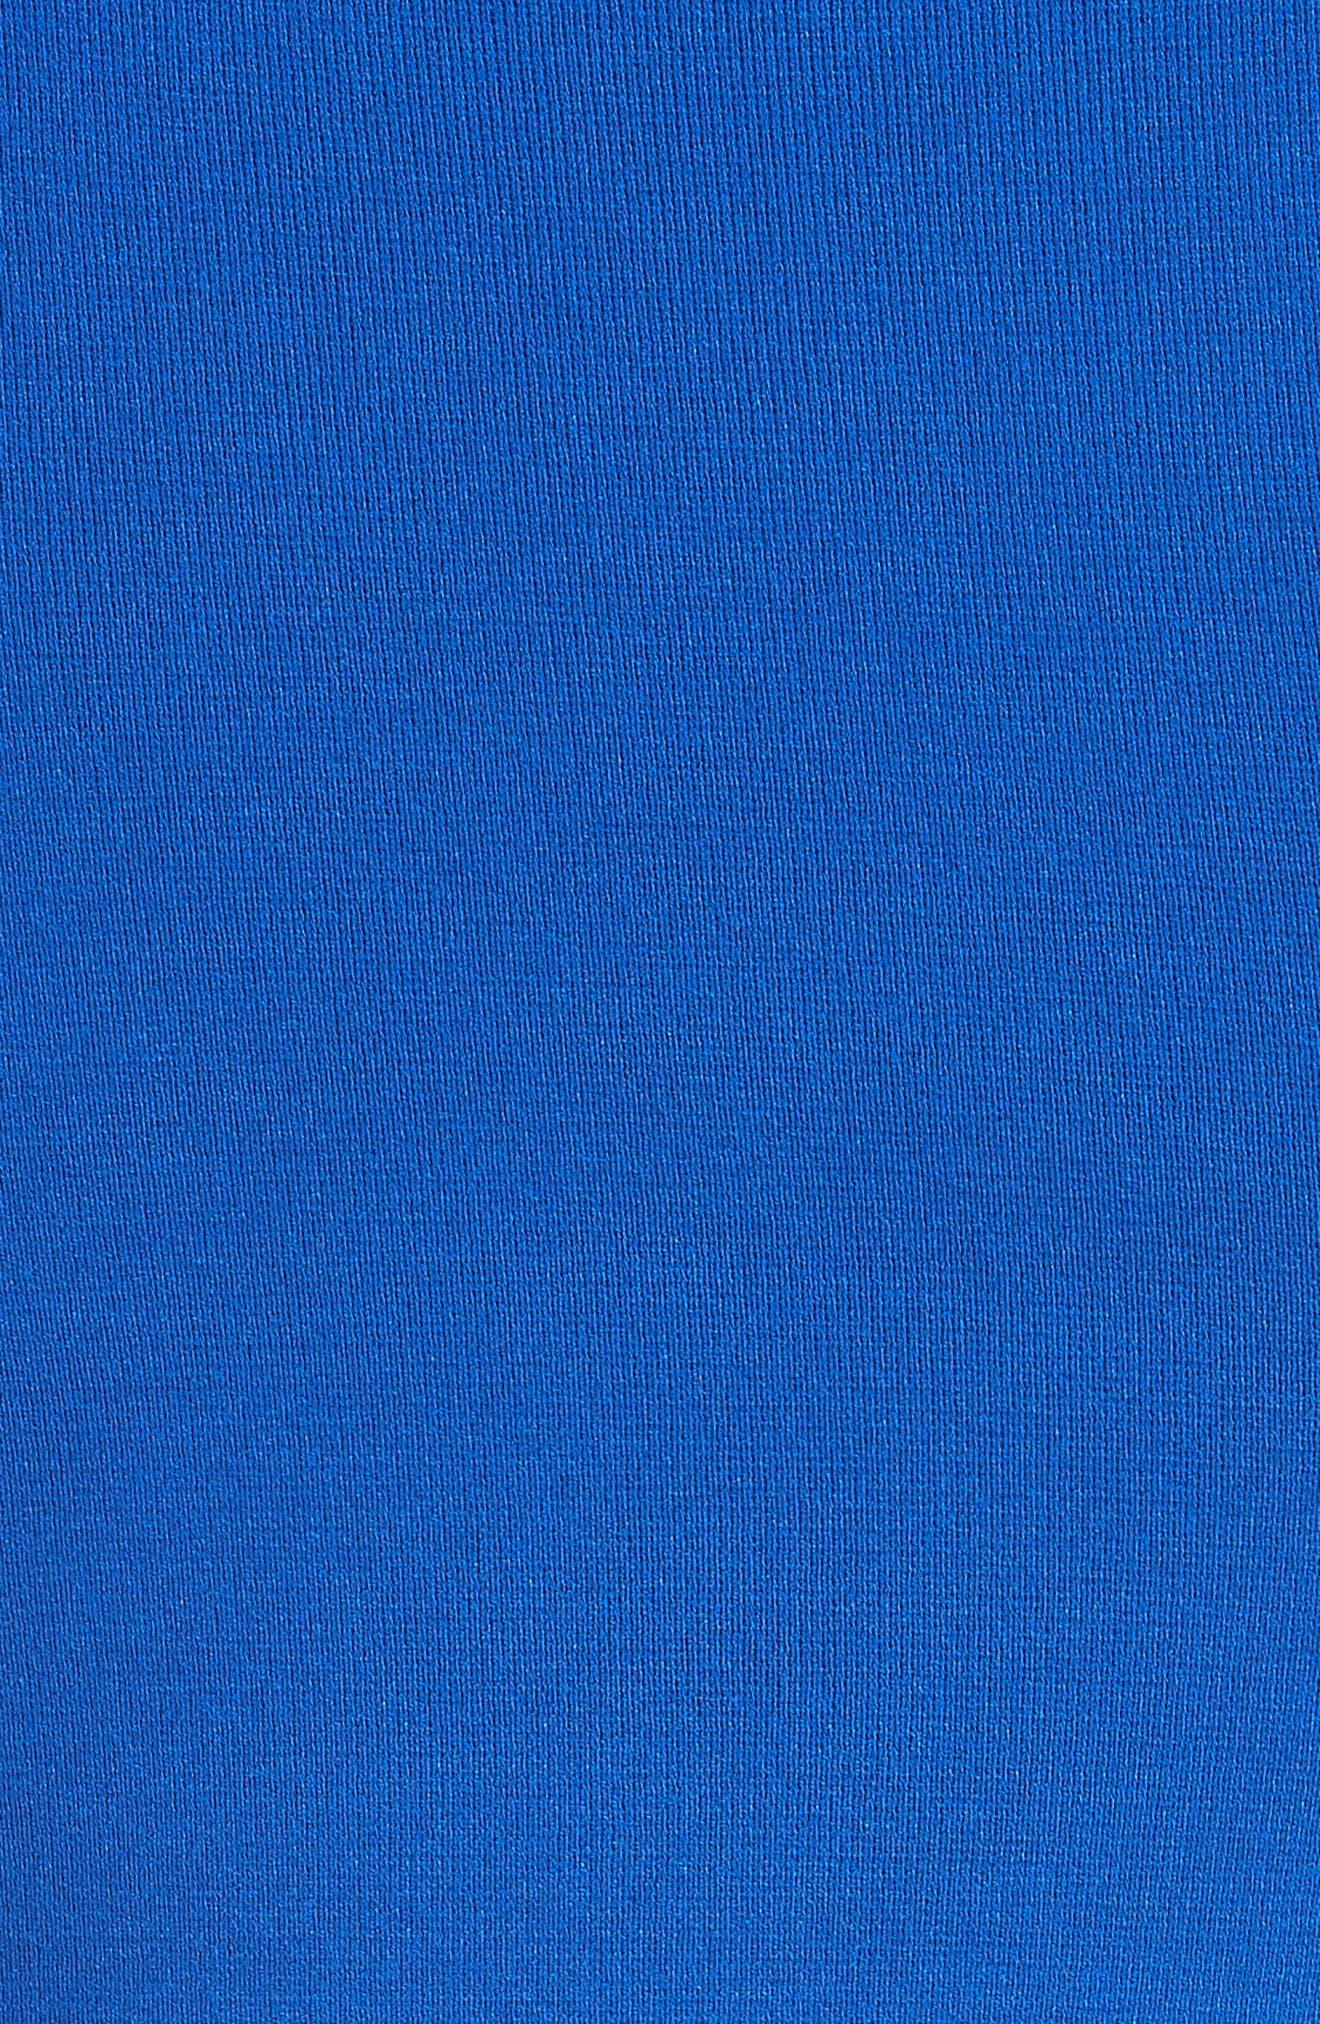 Contrast Stitch Knit Dress,                             Alternate thumbnail 5, color,                             Royal Blue/ Light Blue